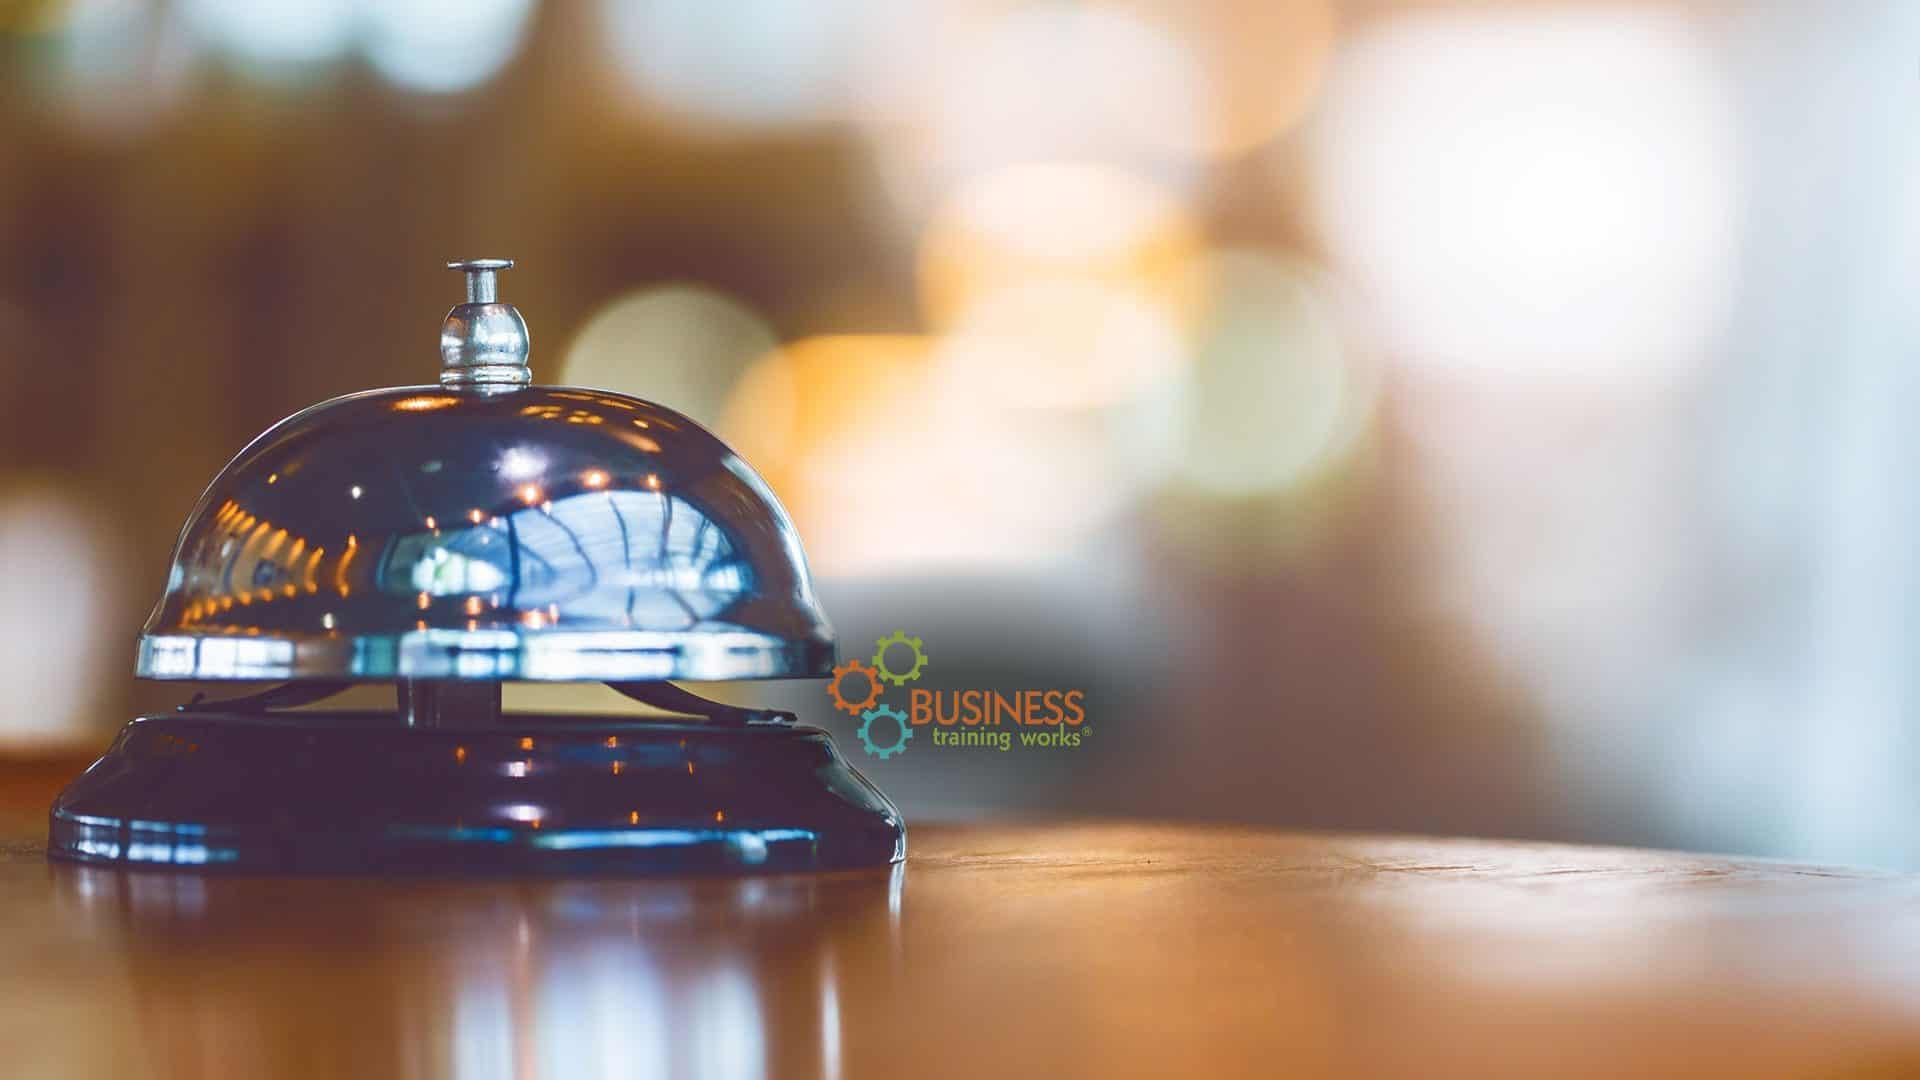 Customer Service Training for Hospitality